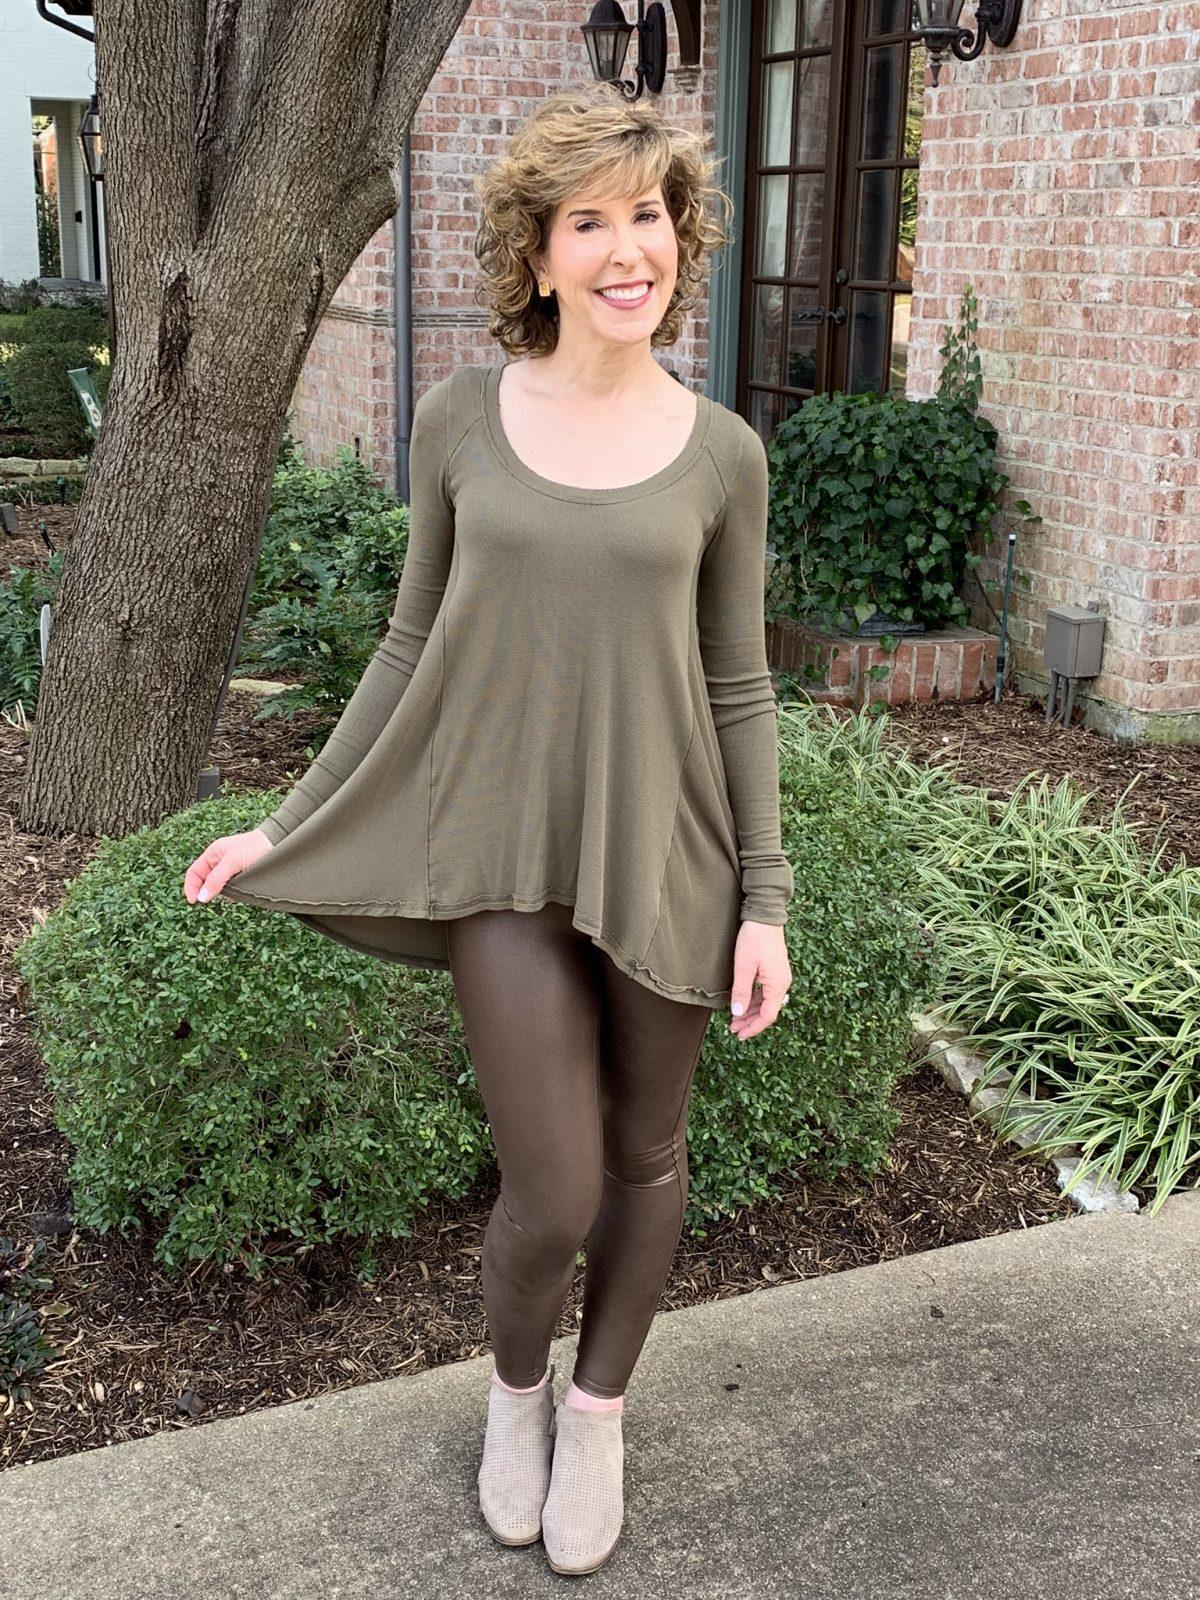 woman posing in green top in front yard